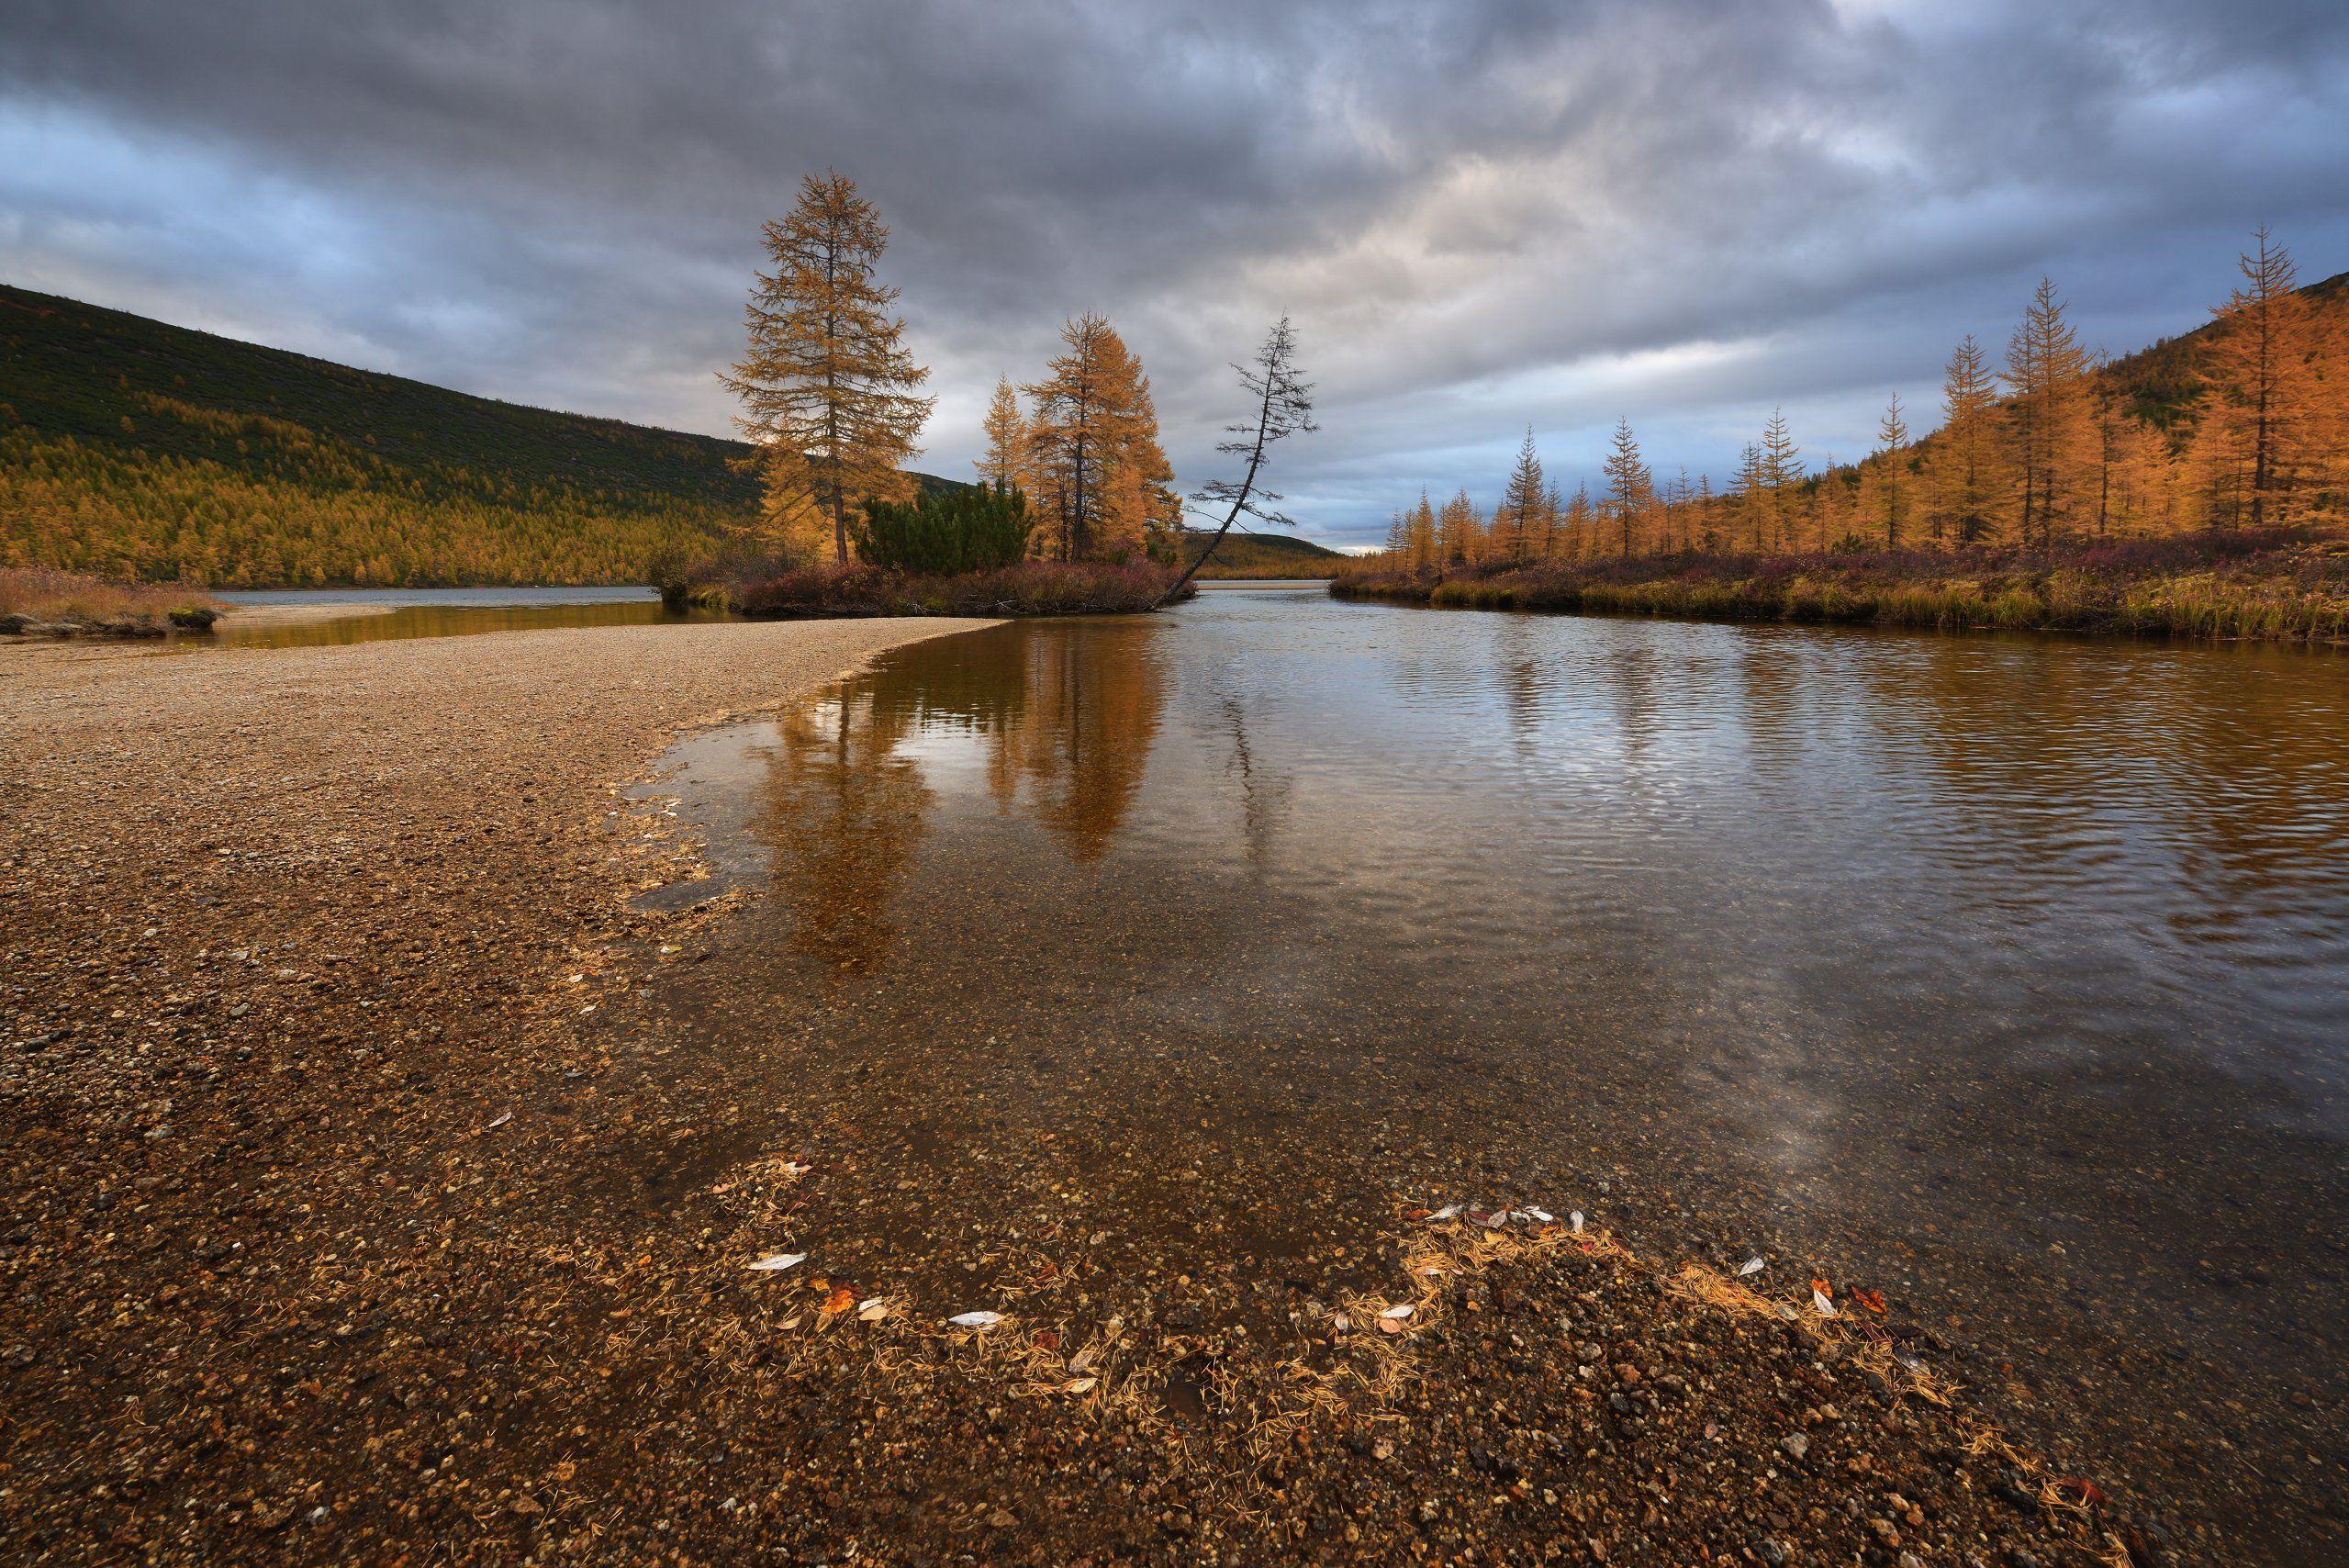 Озеро Джека Лондона, Максим Евдокимов (phototourtravel.ru)